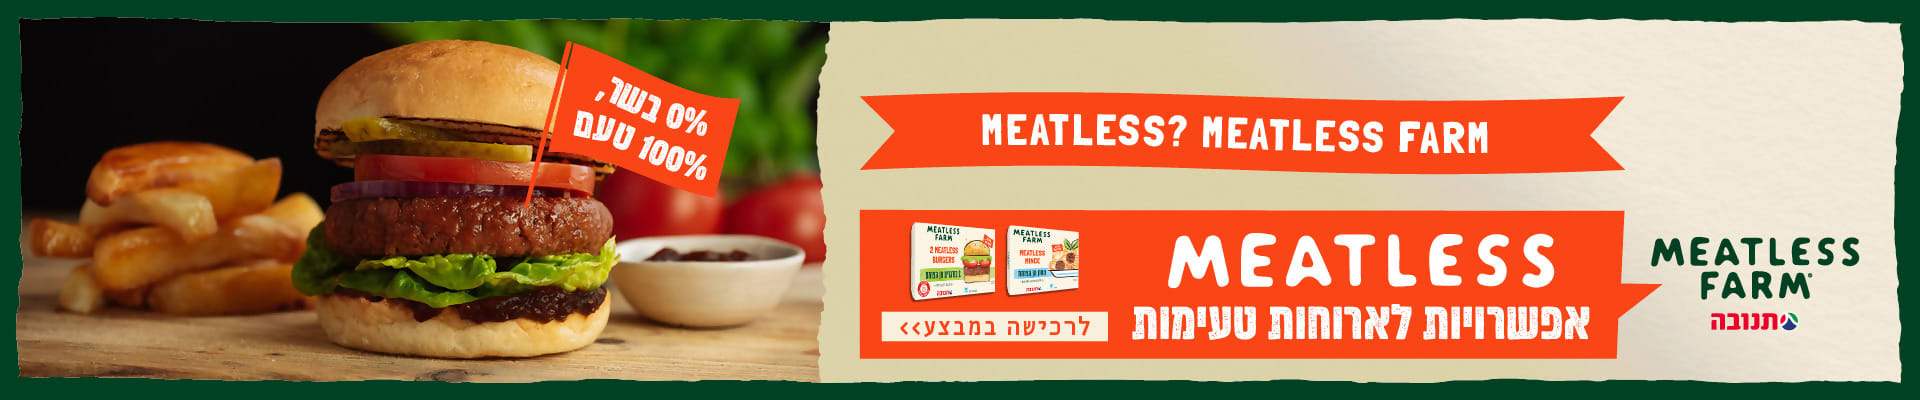 Meatless? Meatless farm תנובה 0% בשר, 100% טעם MEATLESS אפשרויות לארוחות טעימות לרכישה במבצע